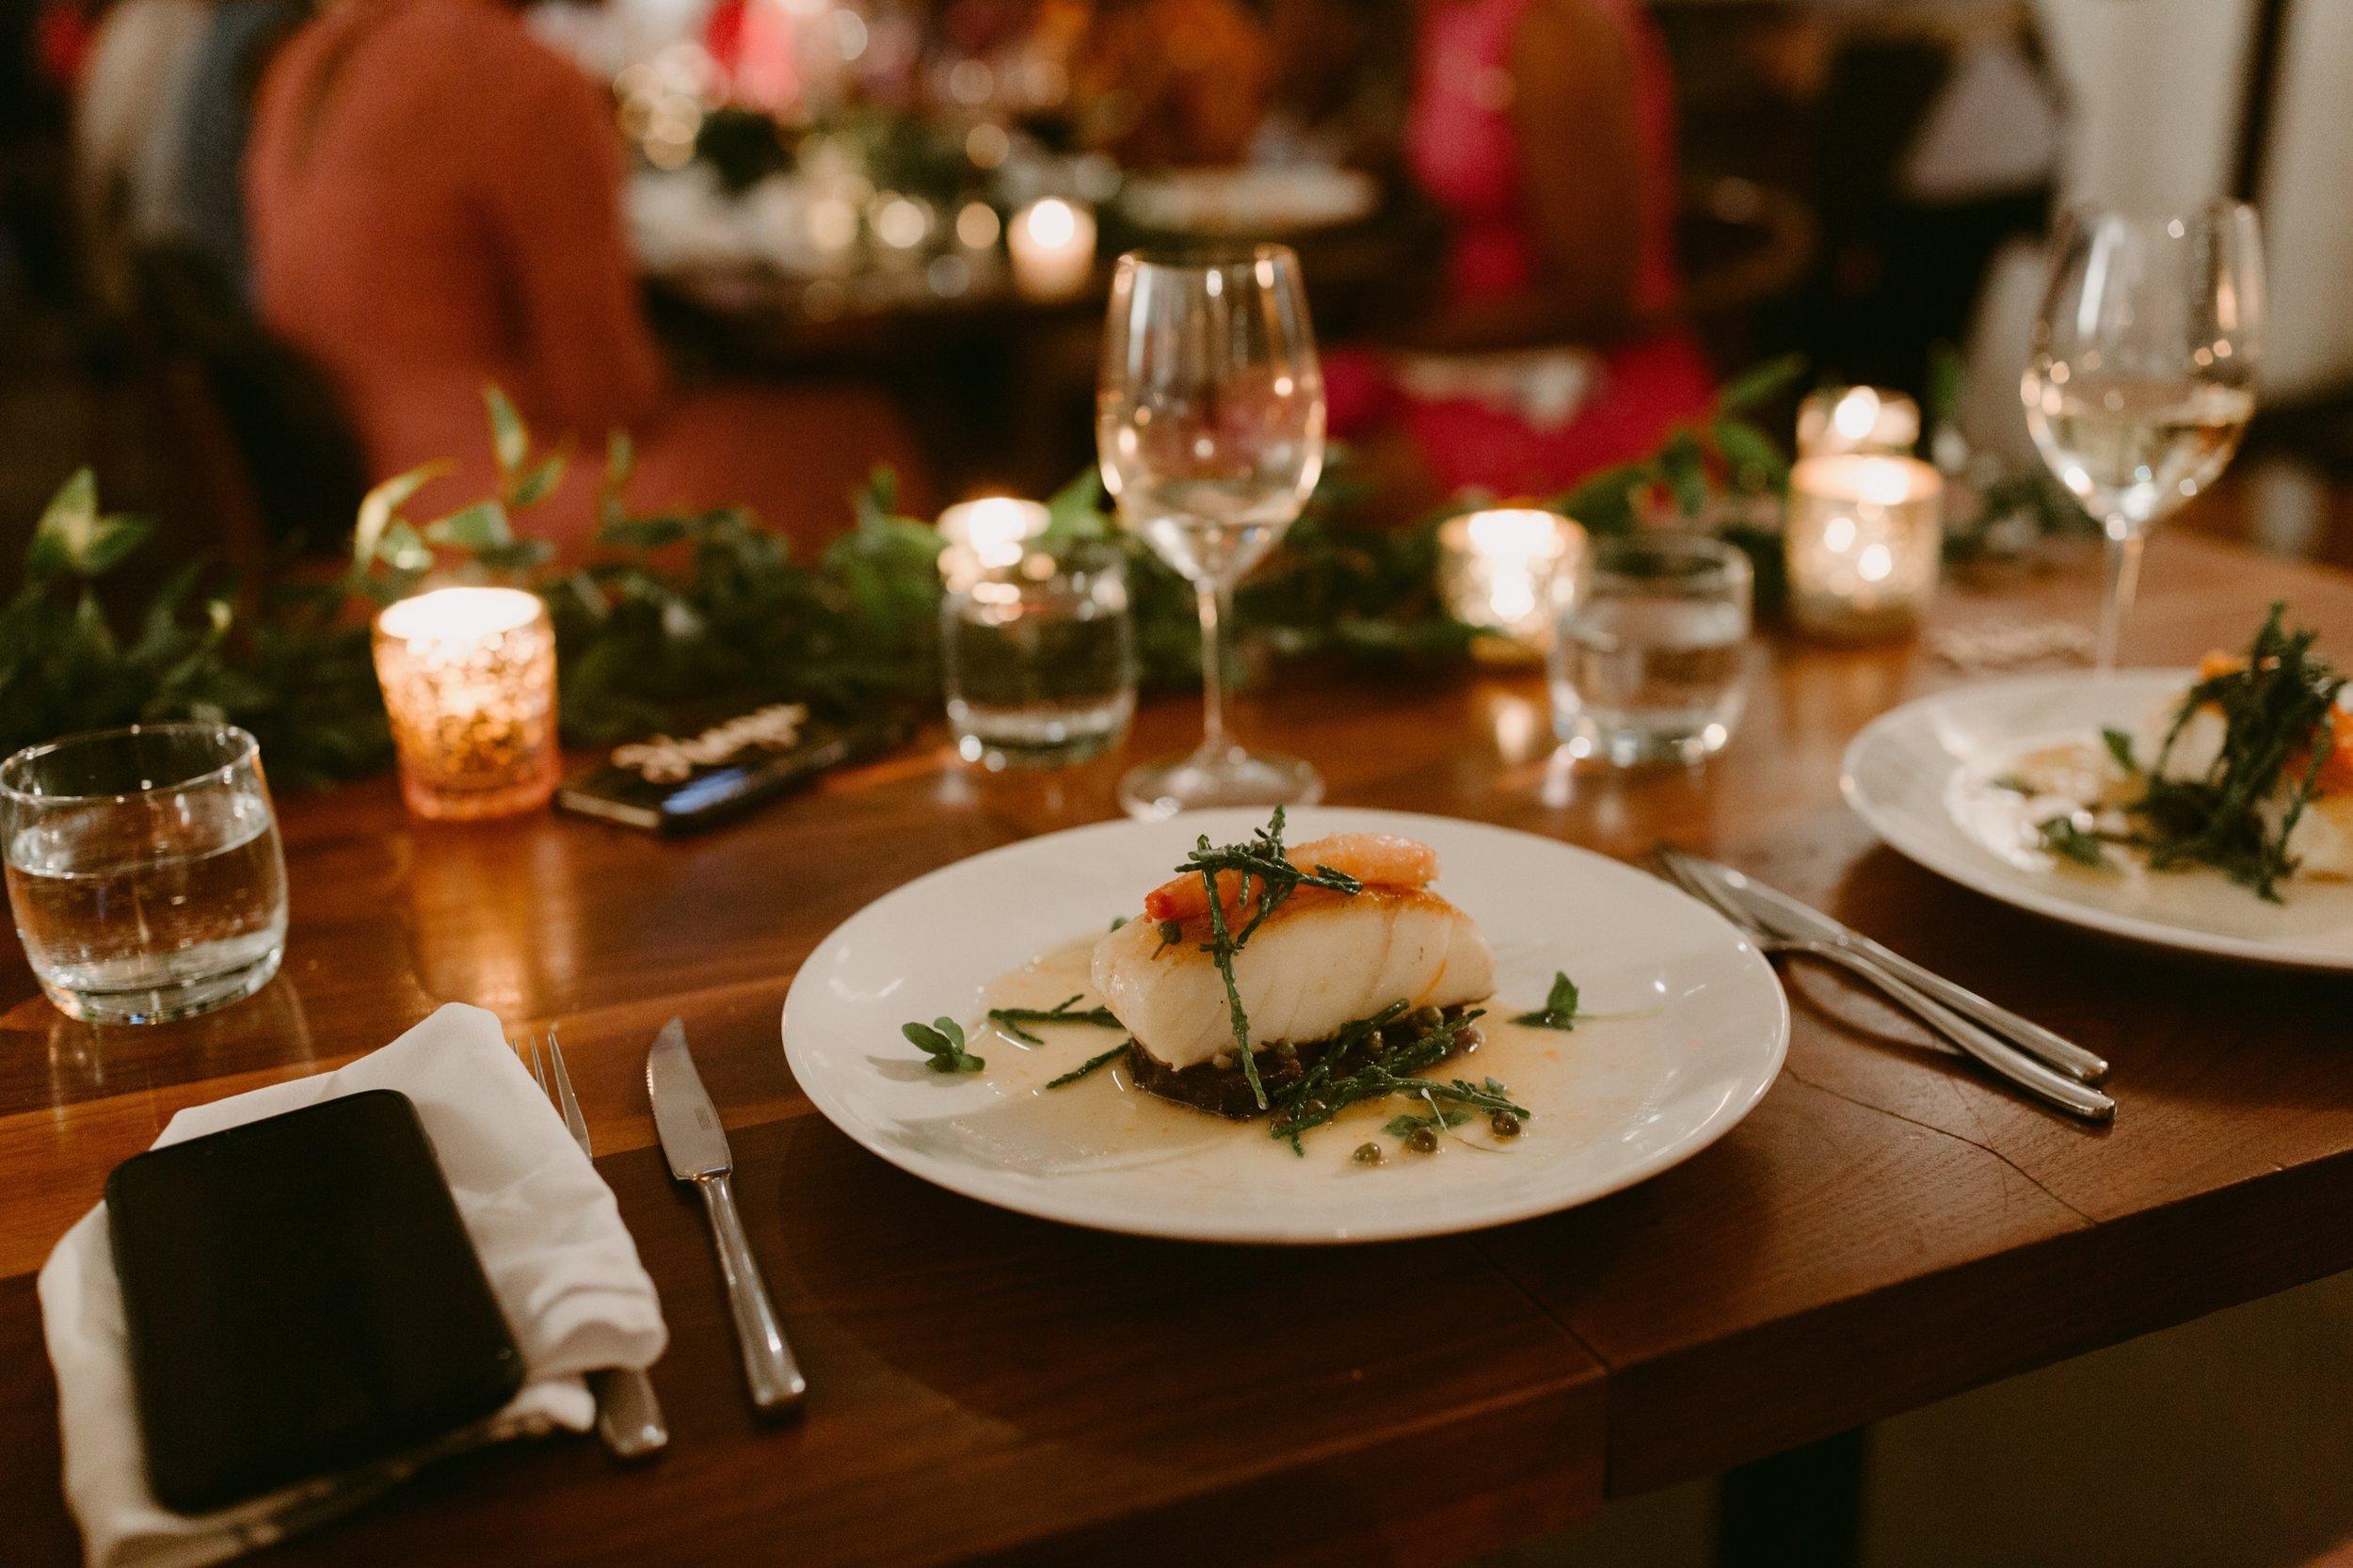 082_Spadina House Wedding (533 of 748)_intimate_Boehmer_Restaurant_Toronto_Wedding.jpg